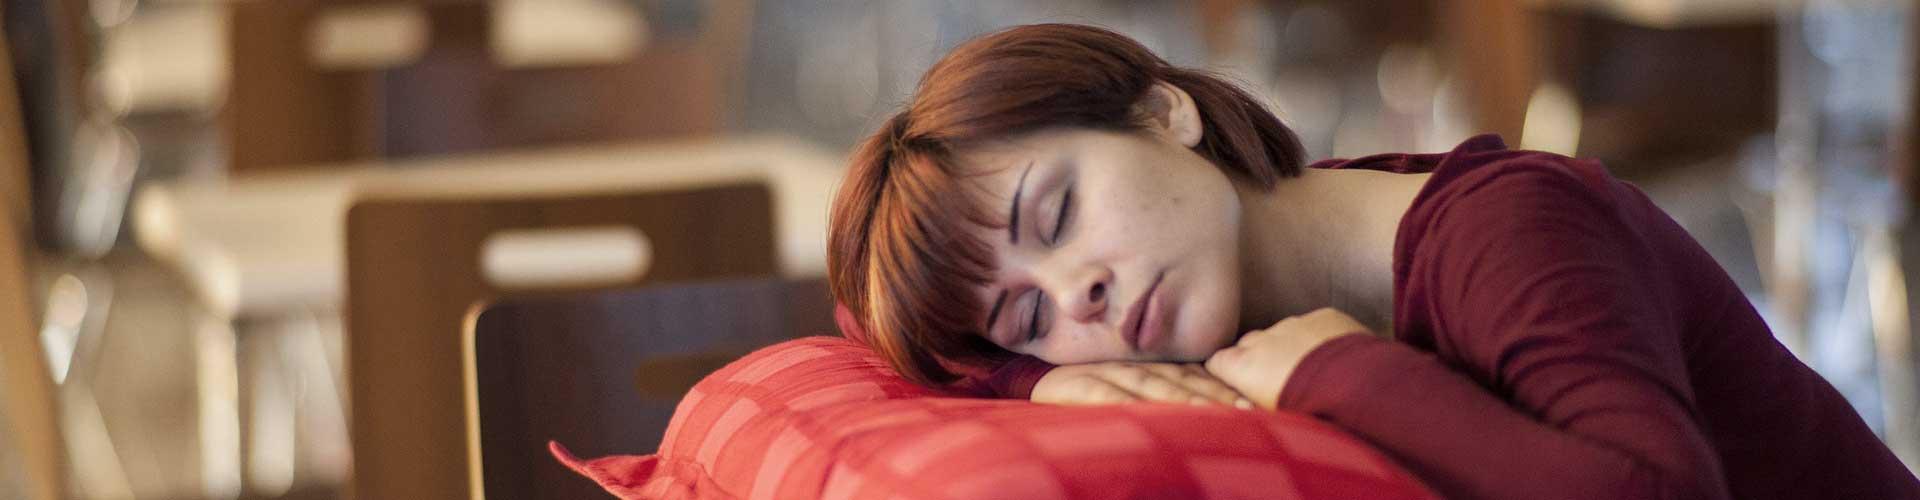 Trastorns de la son